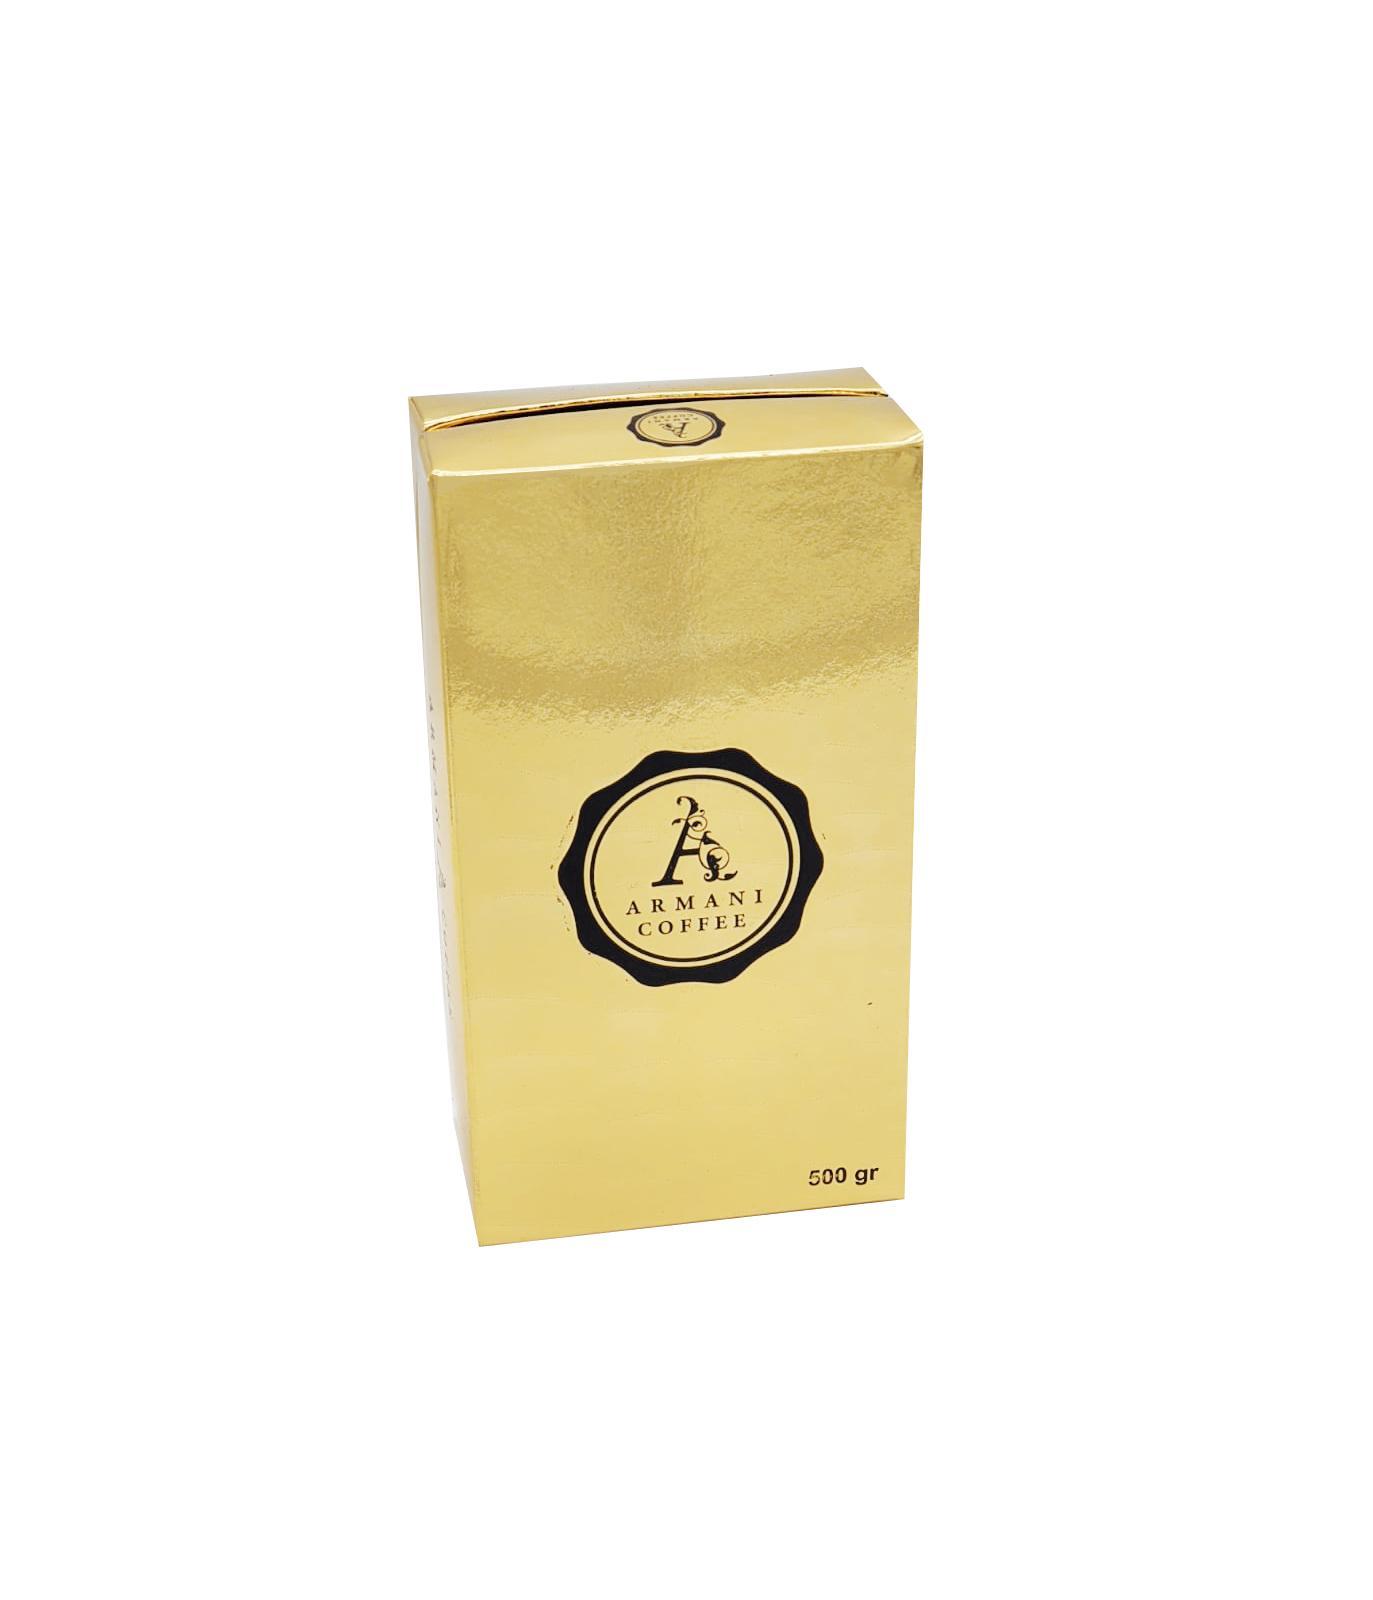 Buy Armani Coffee 500G